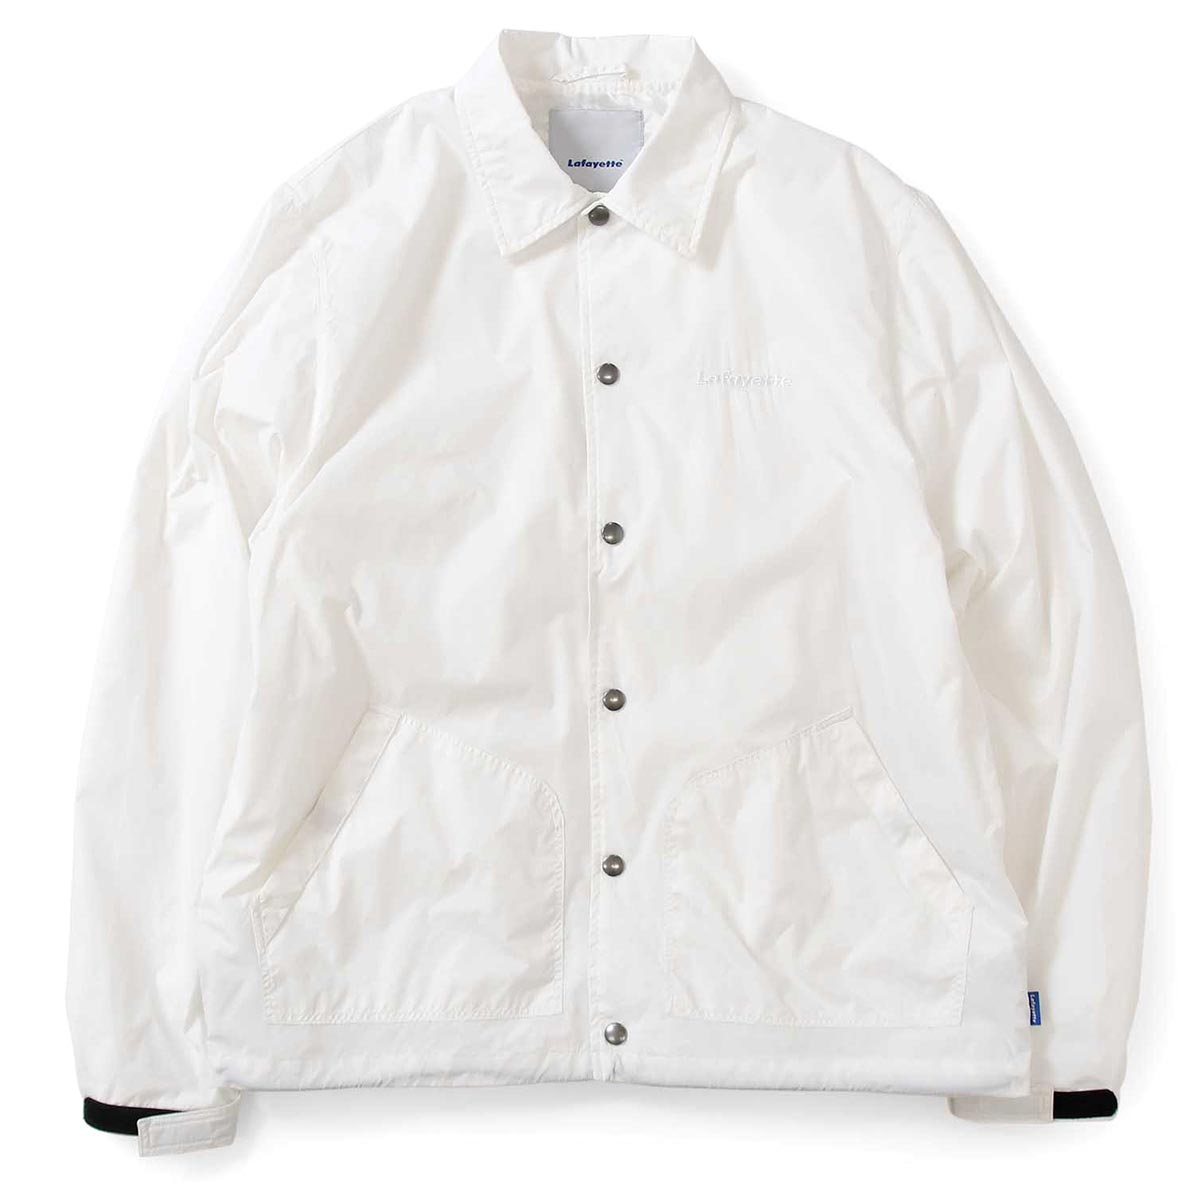 Lafayette ラファイエット コーチジャケット メンズ ストリート ブランド ジャンパー 上着 アウター ロゴ 刺繍 BASIC COACH JACKET LS201003 WHITE ホワイト